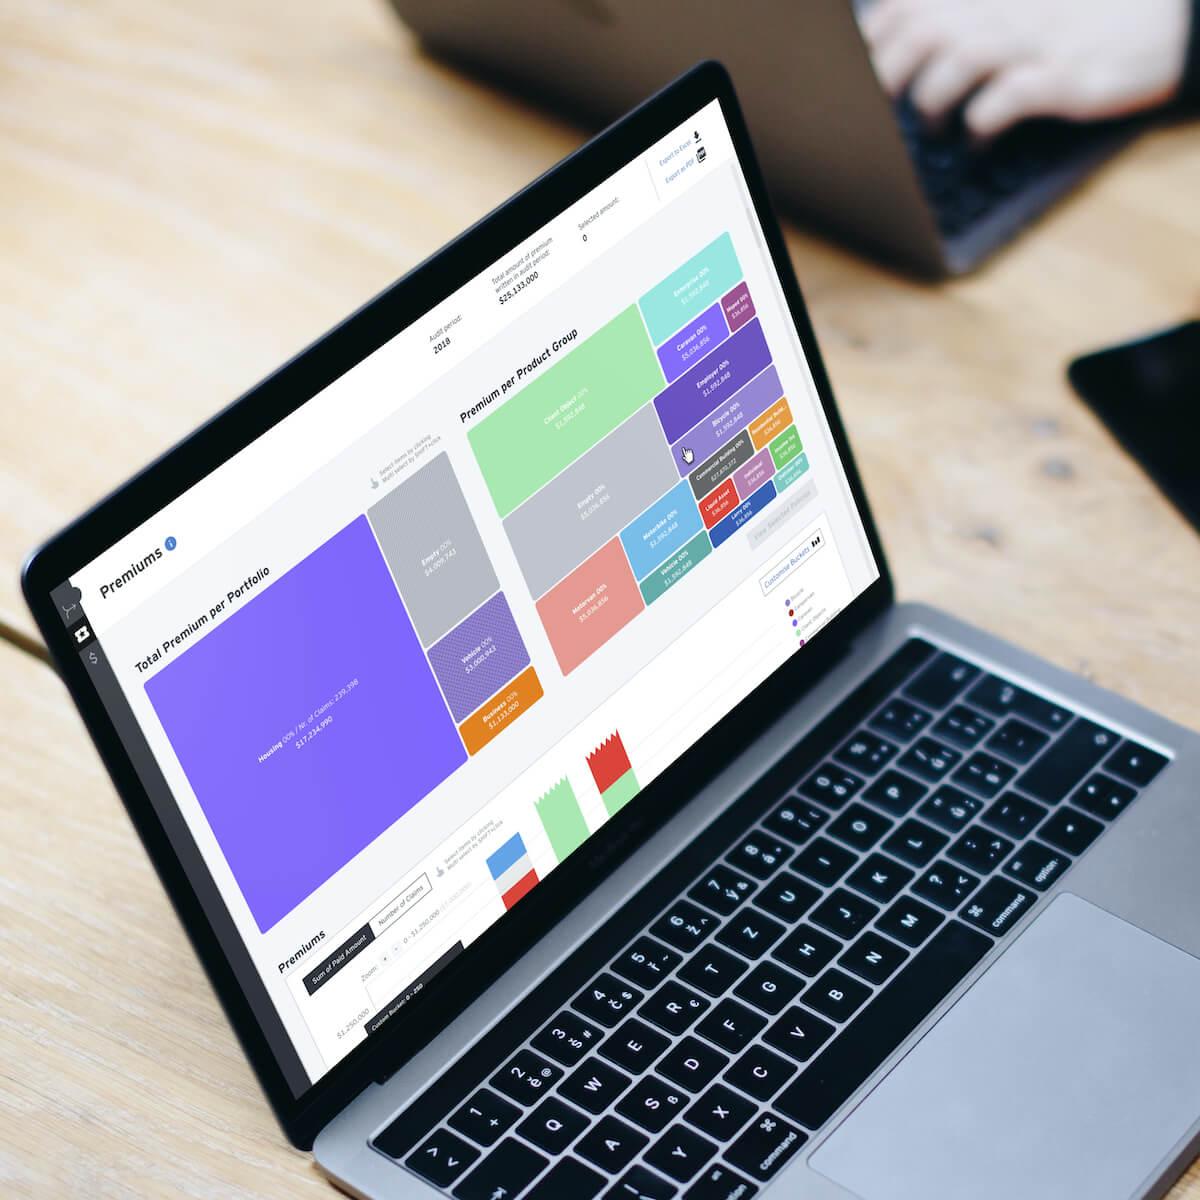 enterprise data visualisation software, web app